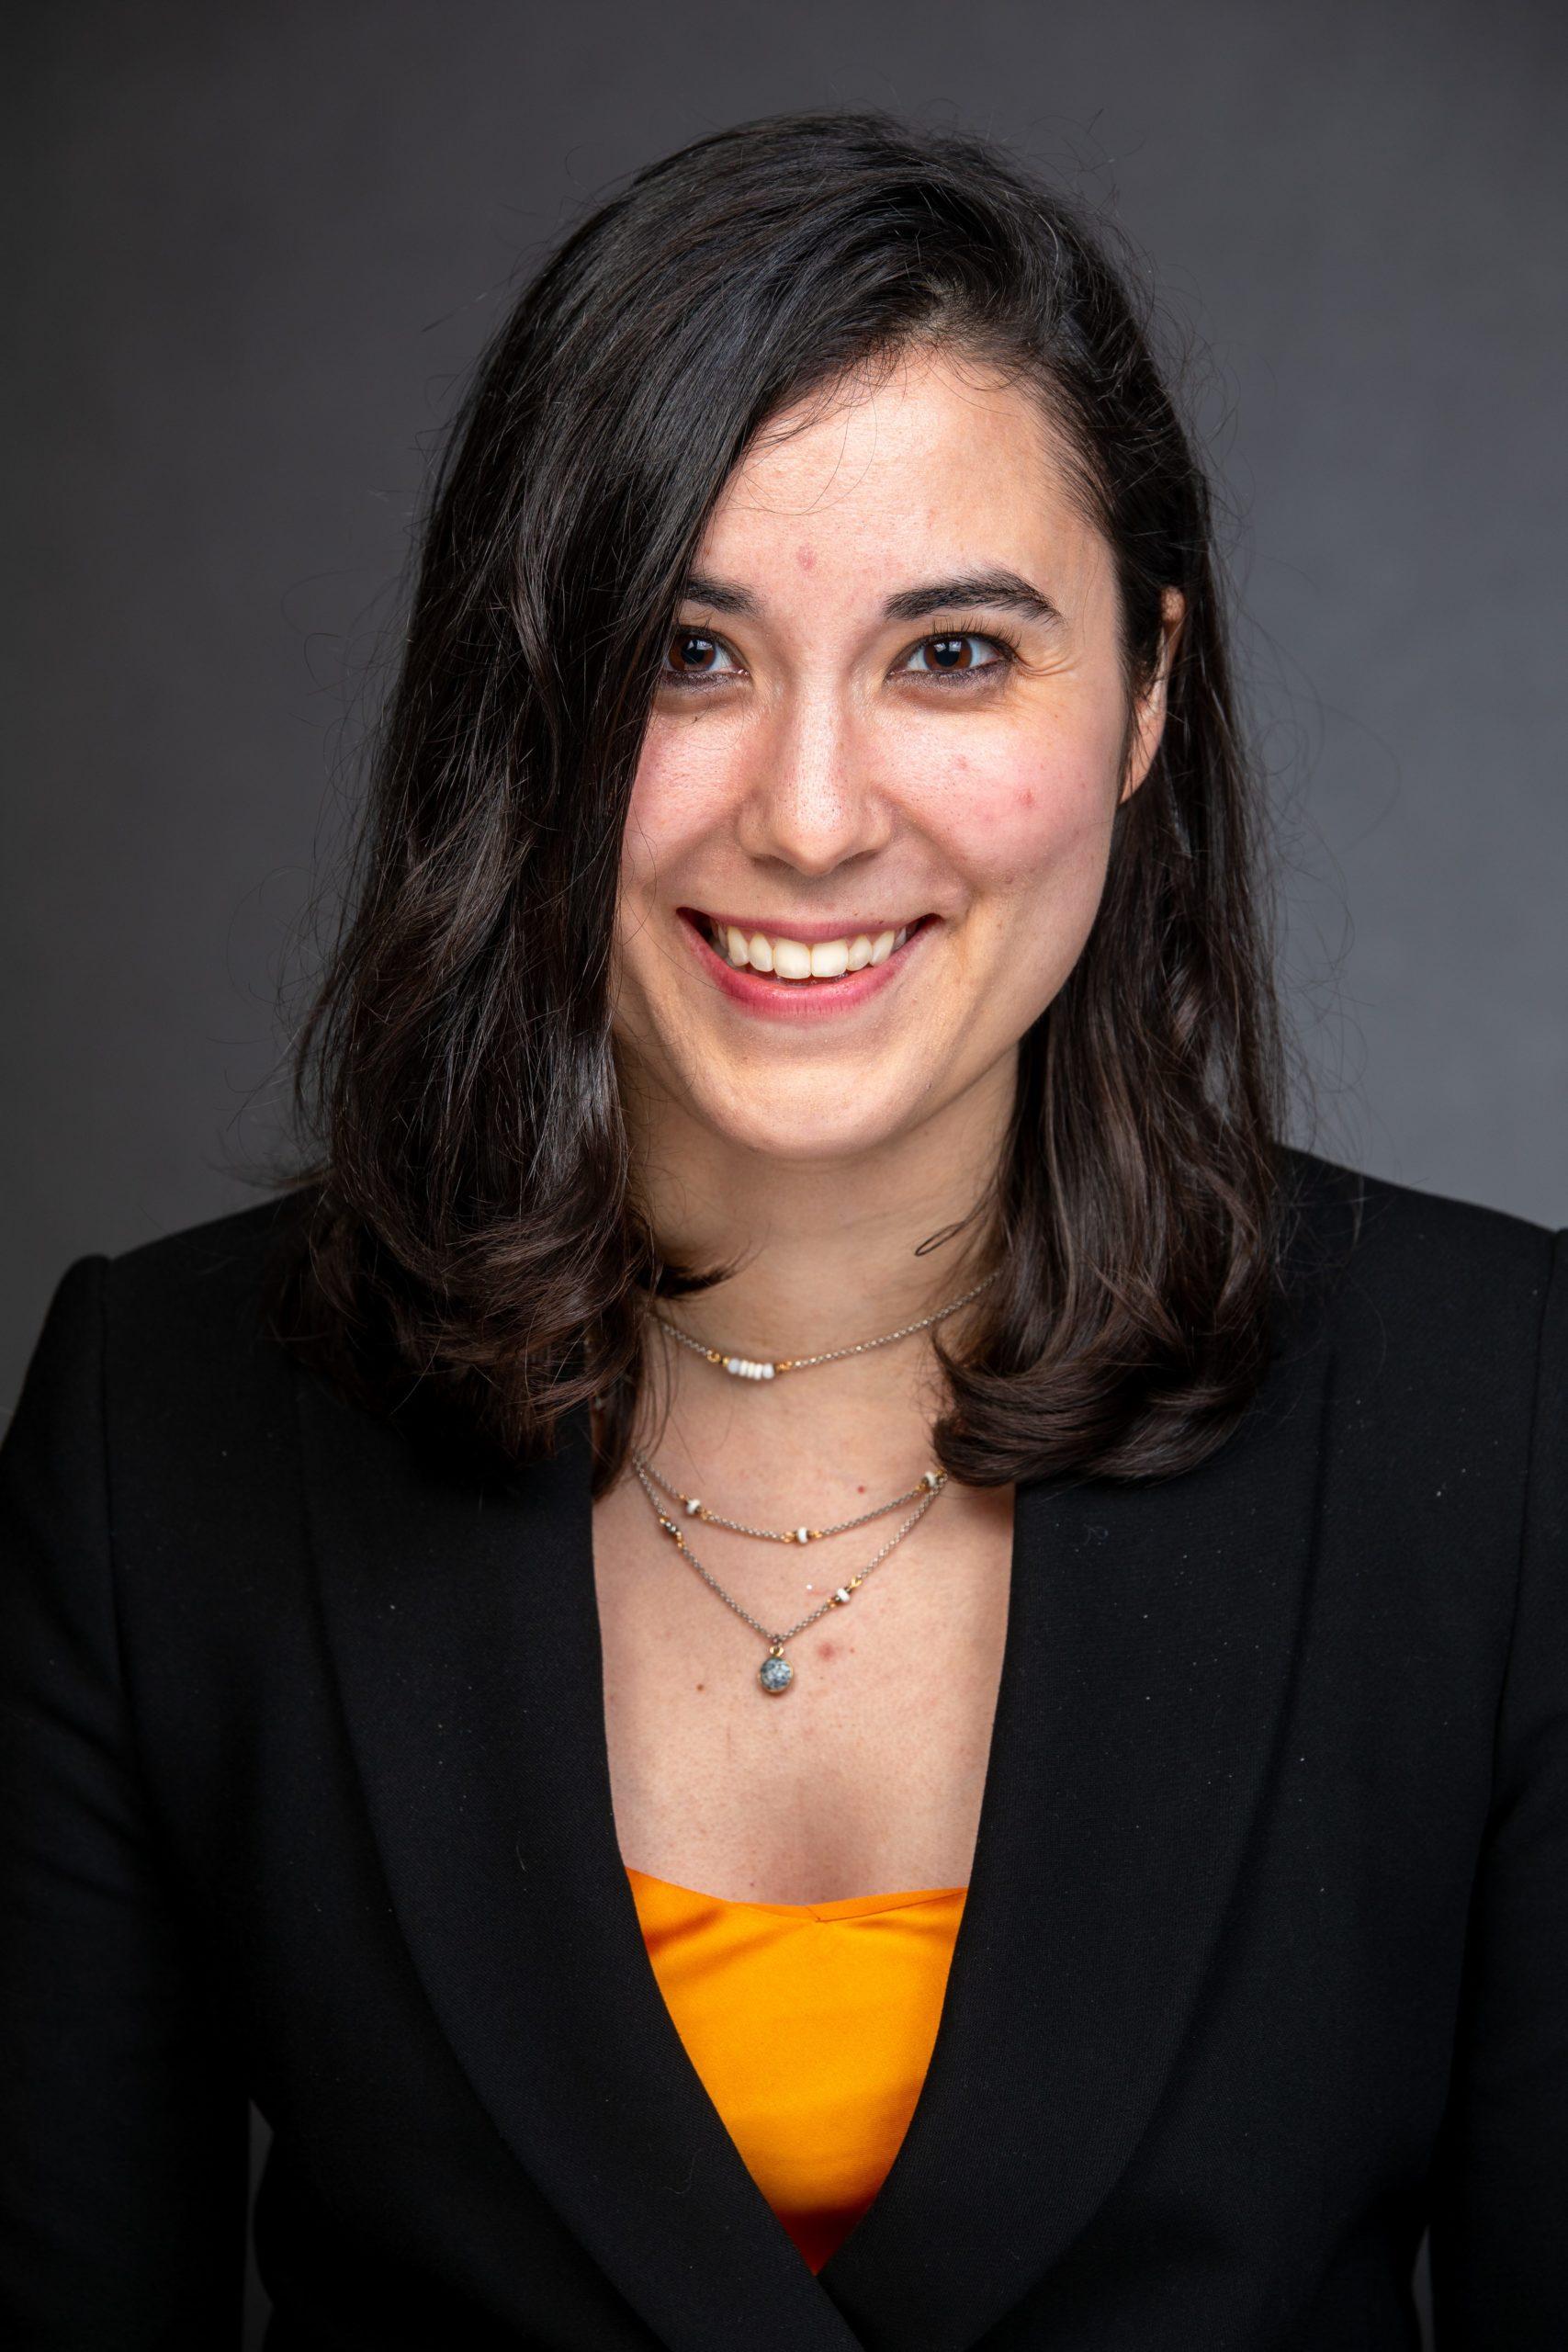 Christine Londergan